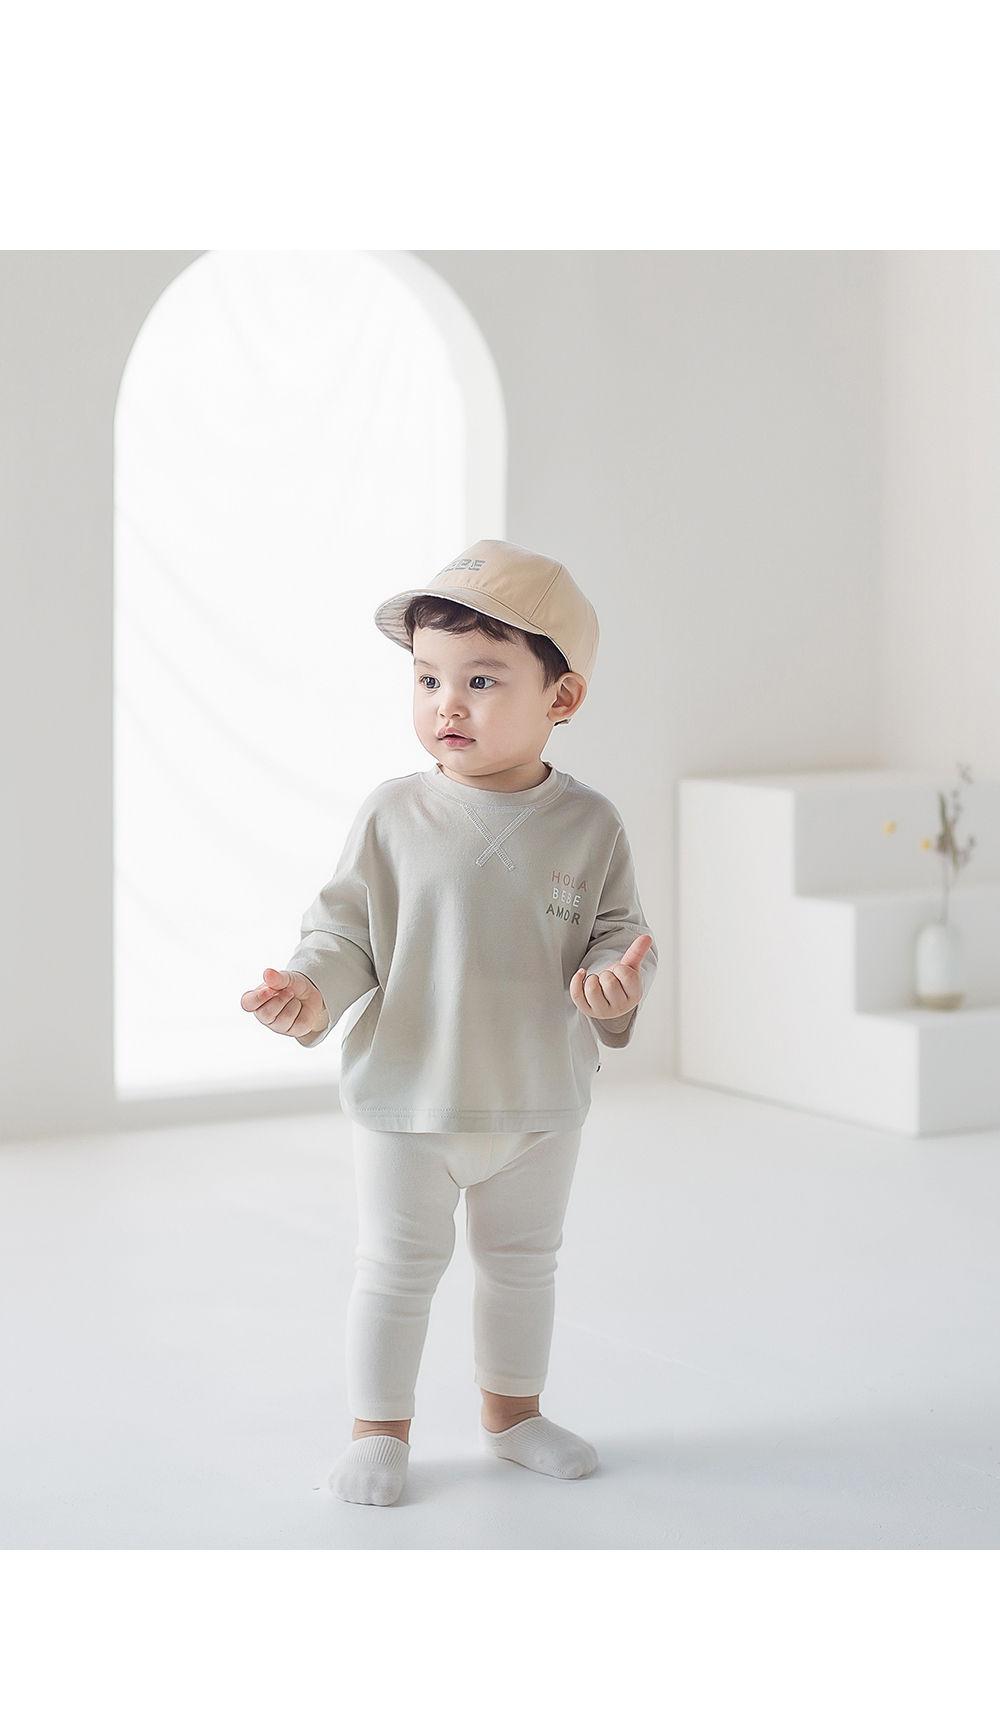 KIDS CLARA - Korean Children Fashion - #Kfashion4kids - Nest Baby Boat Socks 2-in-1 [set of 5] - 2